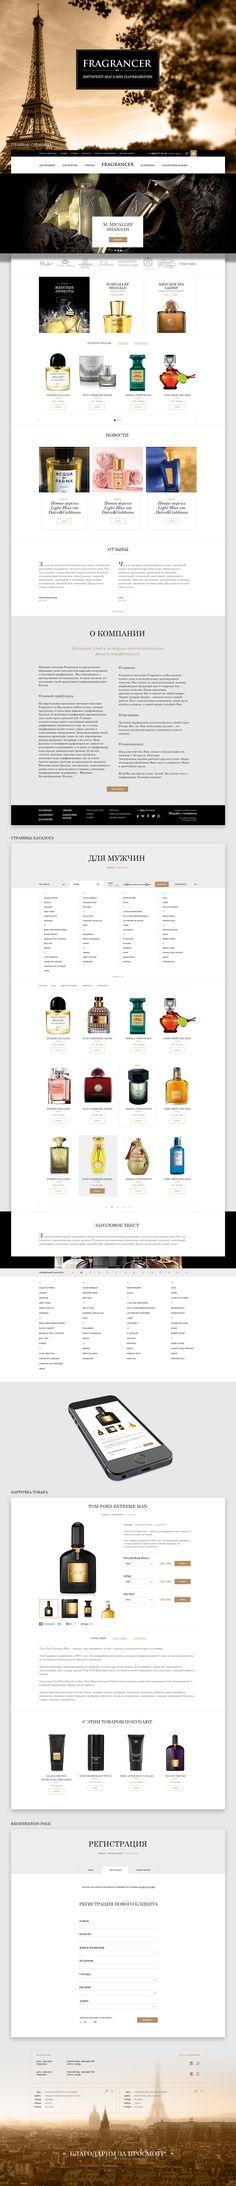 Developed online store luxury perfumes. Unique web design. #shopdev, #opencart, #ecommerce, #опенкарт, #website, #work, #портфолио, #commerce, #коммерция, #market, #onlineshop, #cart, #shop, #store, #адаптивный, #adaptivedesign, #дизайн, #вебдизайн, #интернетмагазин, #онлайнмагазин, #UI, #UX, #webdesign, #webdevelopment.